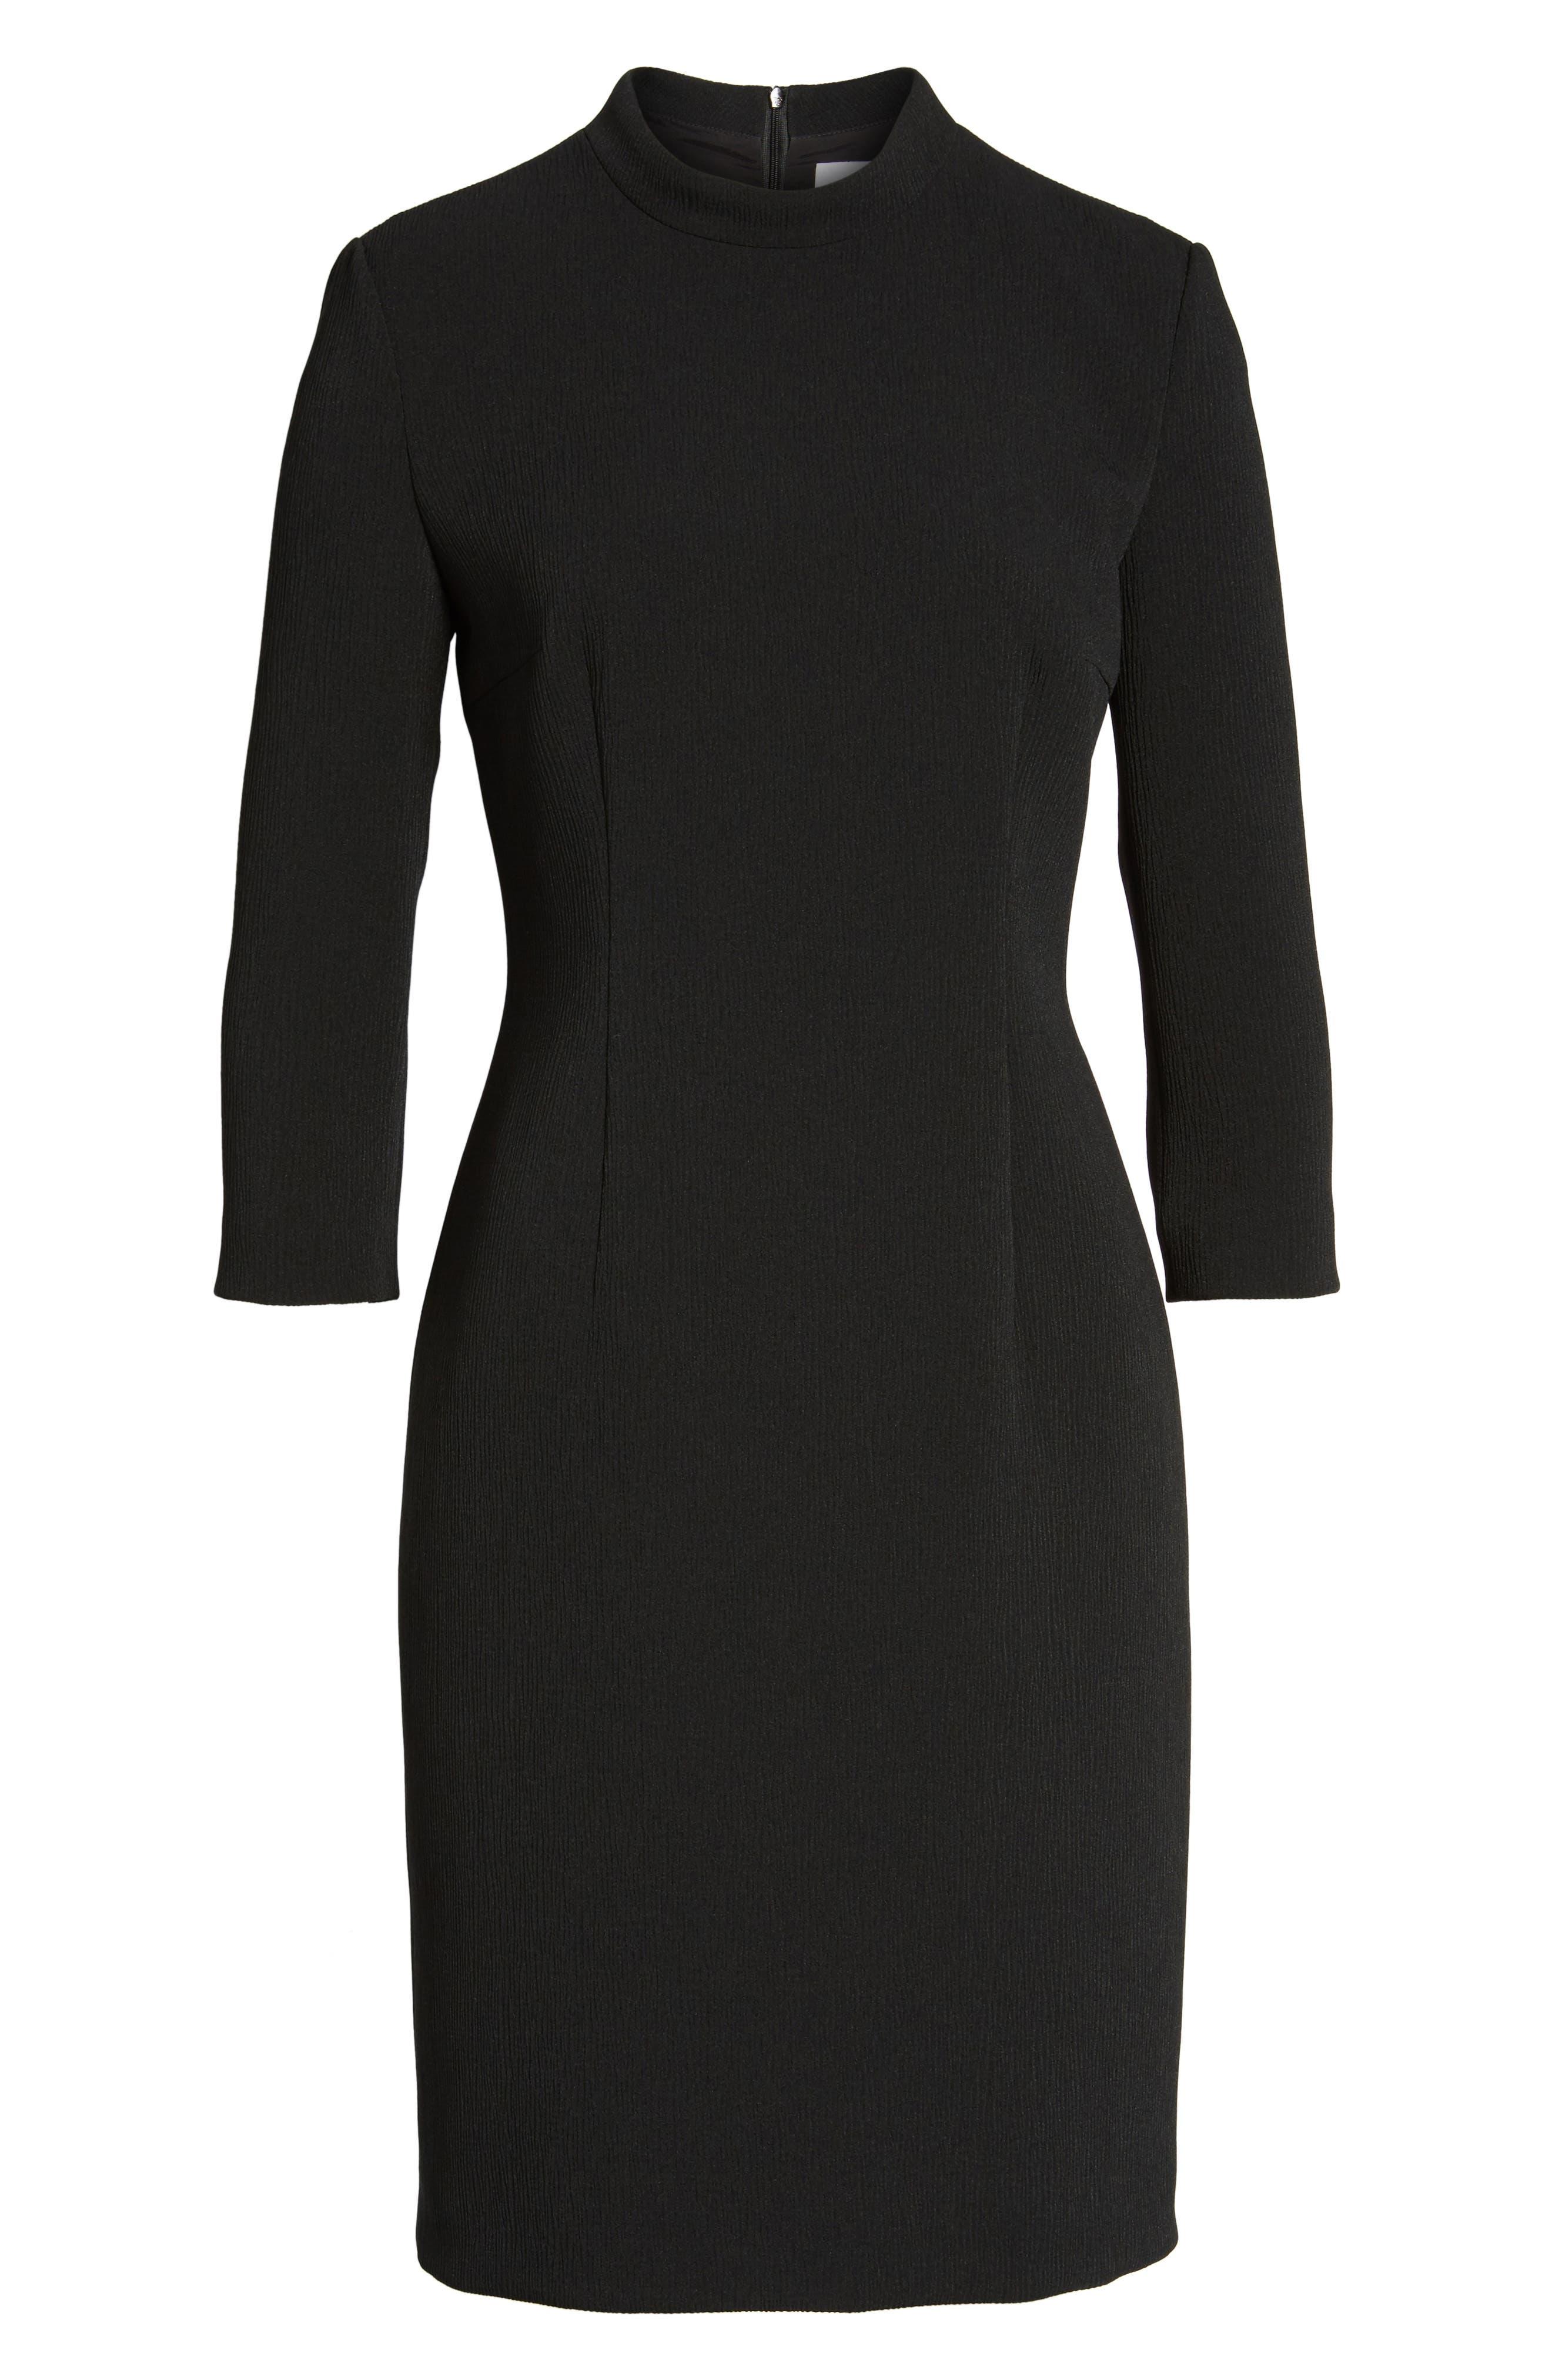 Dadena Crepe Sheath Dress,                             Alternate thumbnail 6, color,                             Black